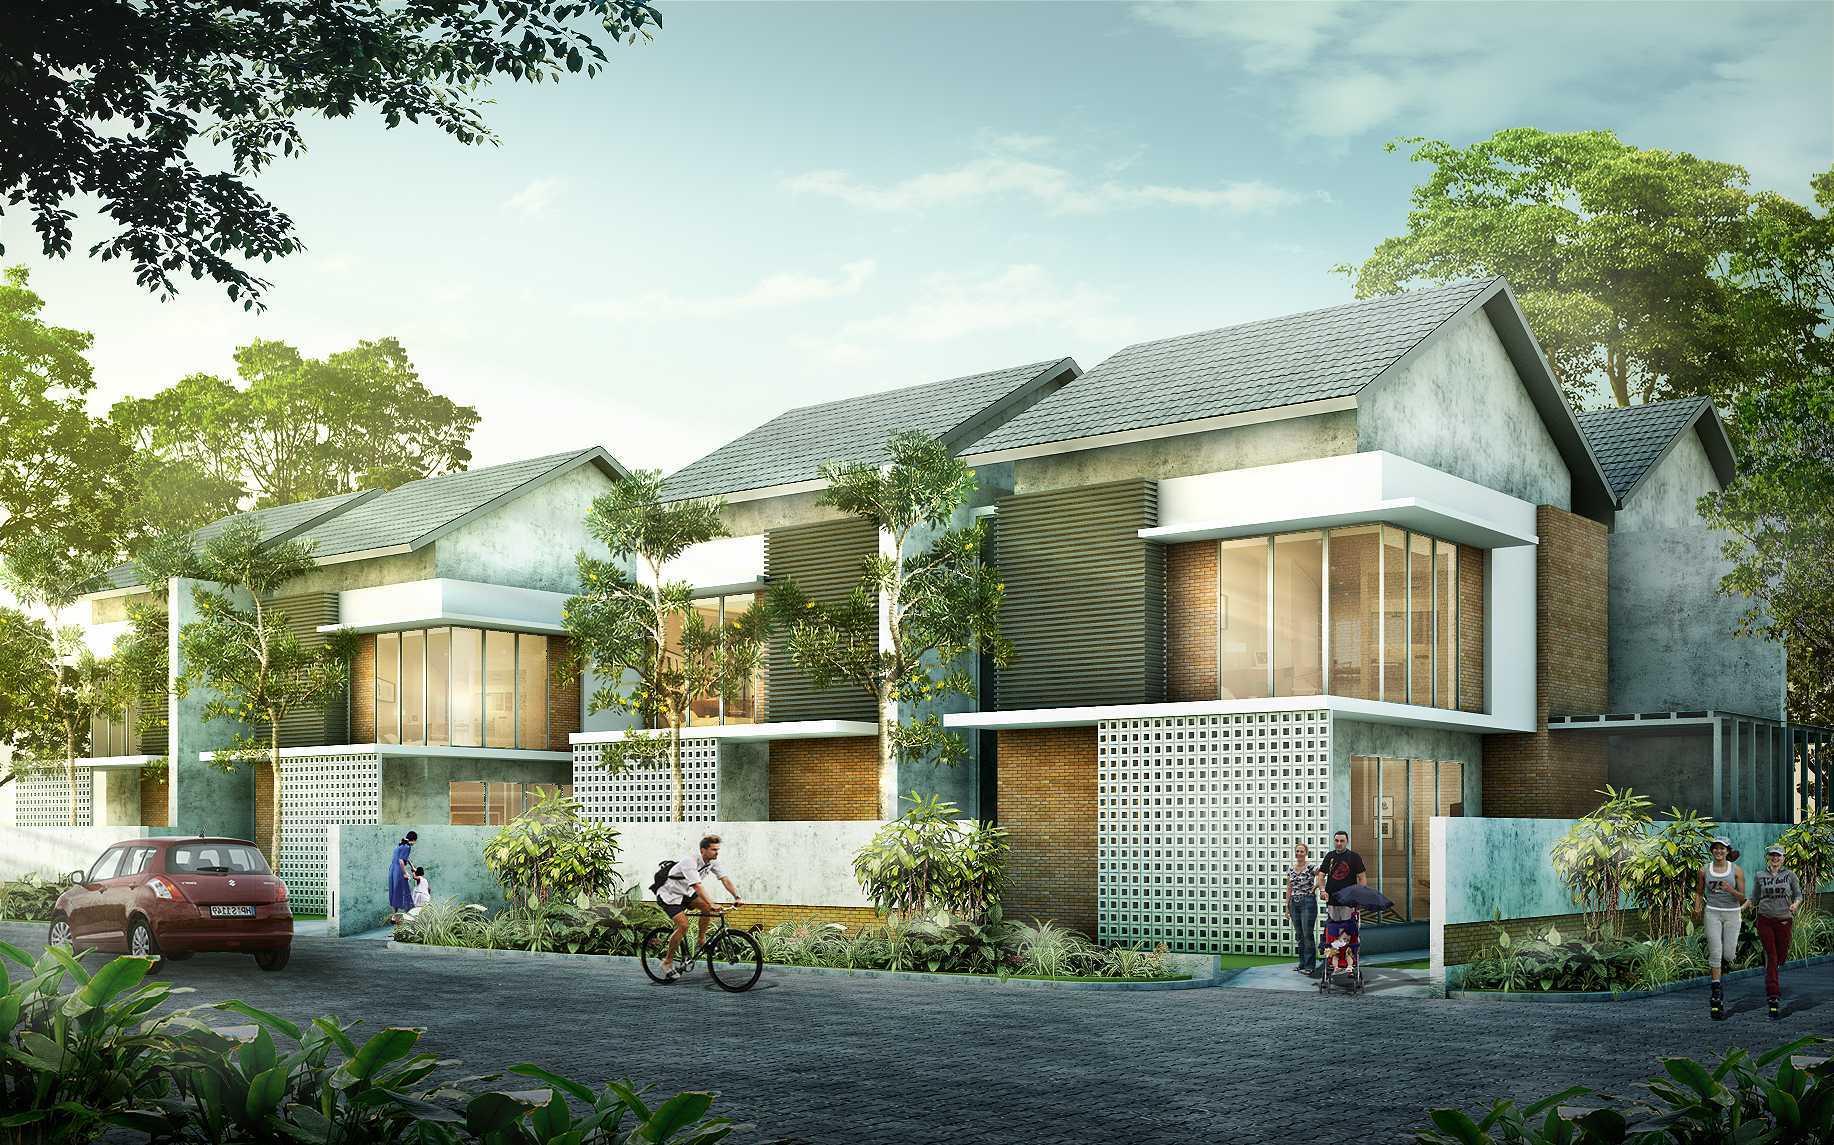 Cravt Studio Permata Residence Magelang, Jawa Tengah, Indonesia Magelang, Jawa Tengah, Indonesia Facade View Minimalist  43629